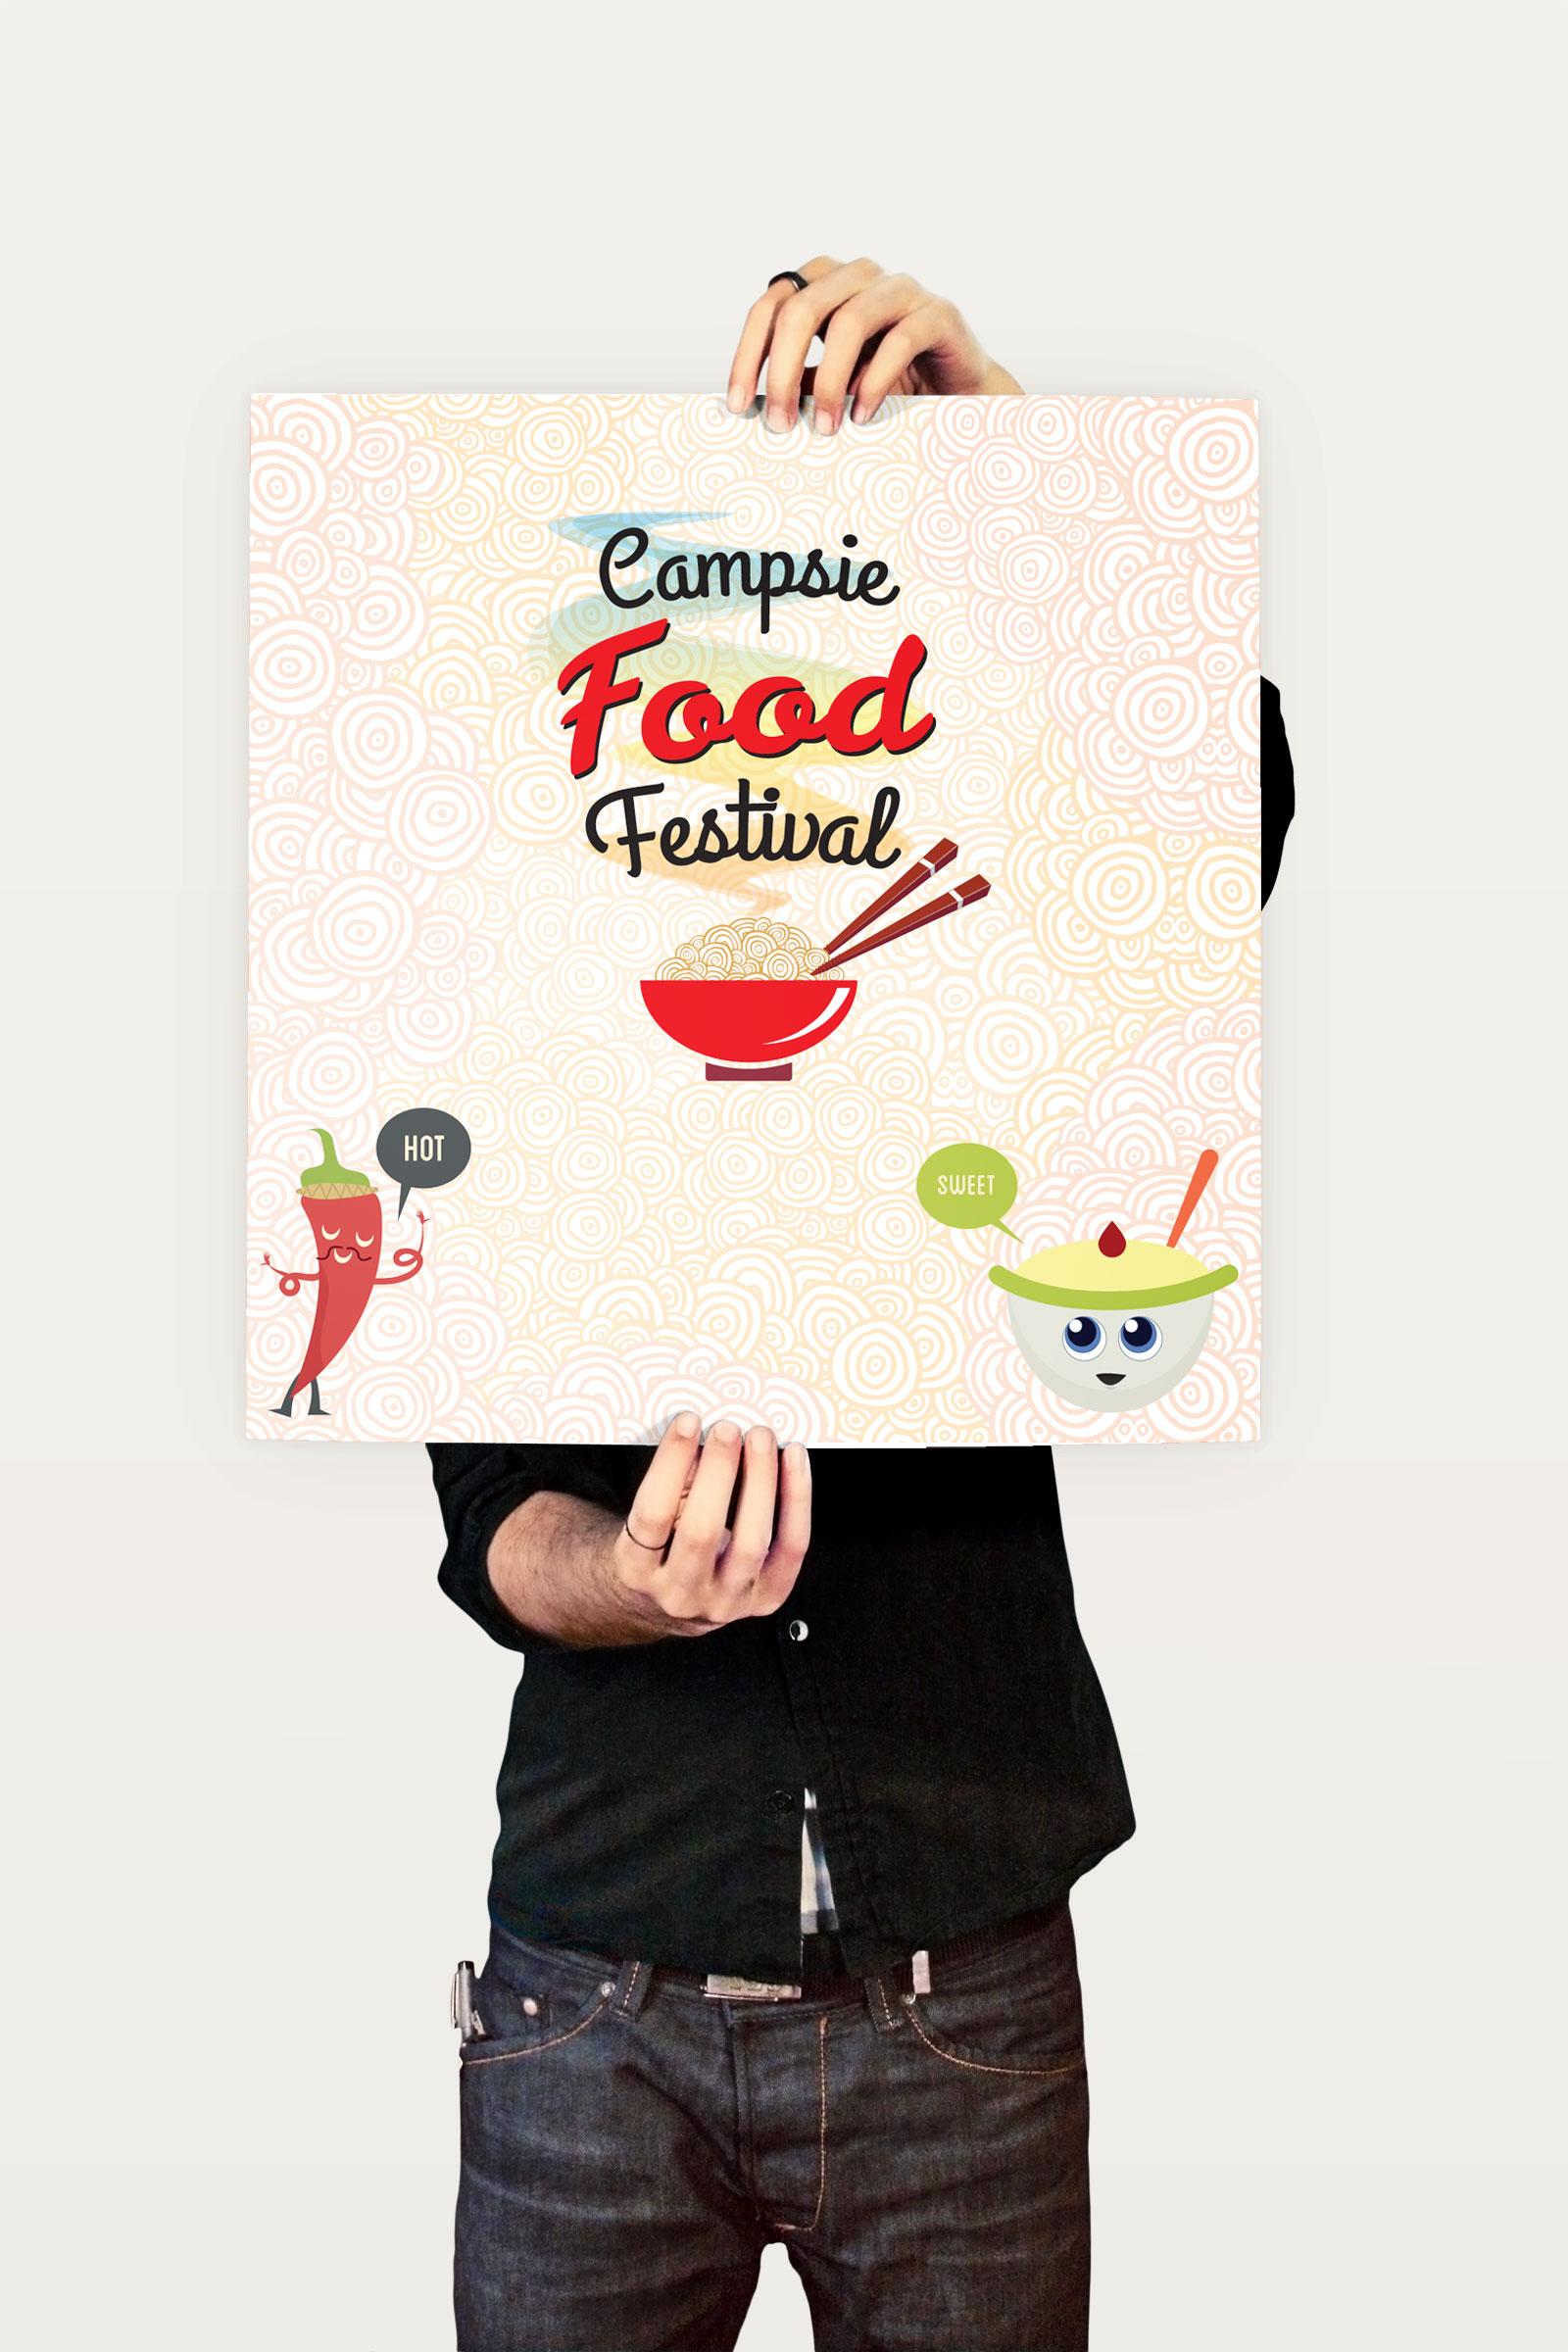 Campsie Food Festival Poster 2